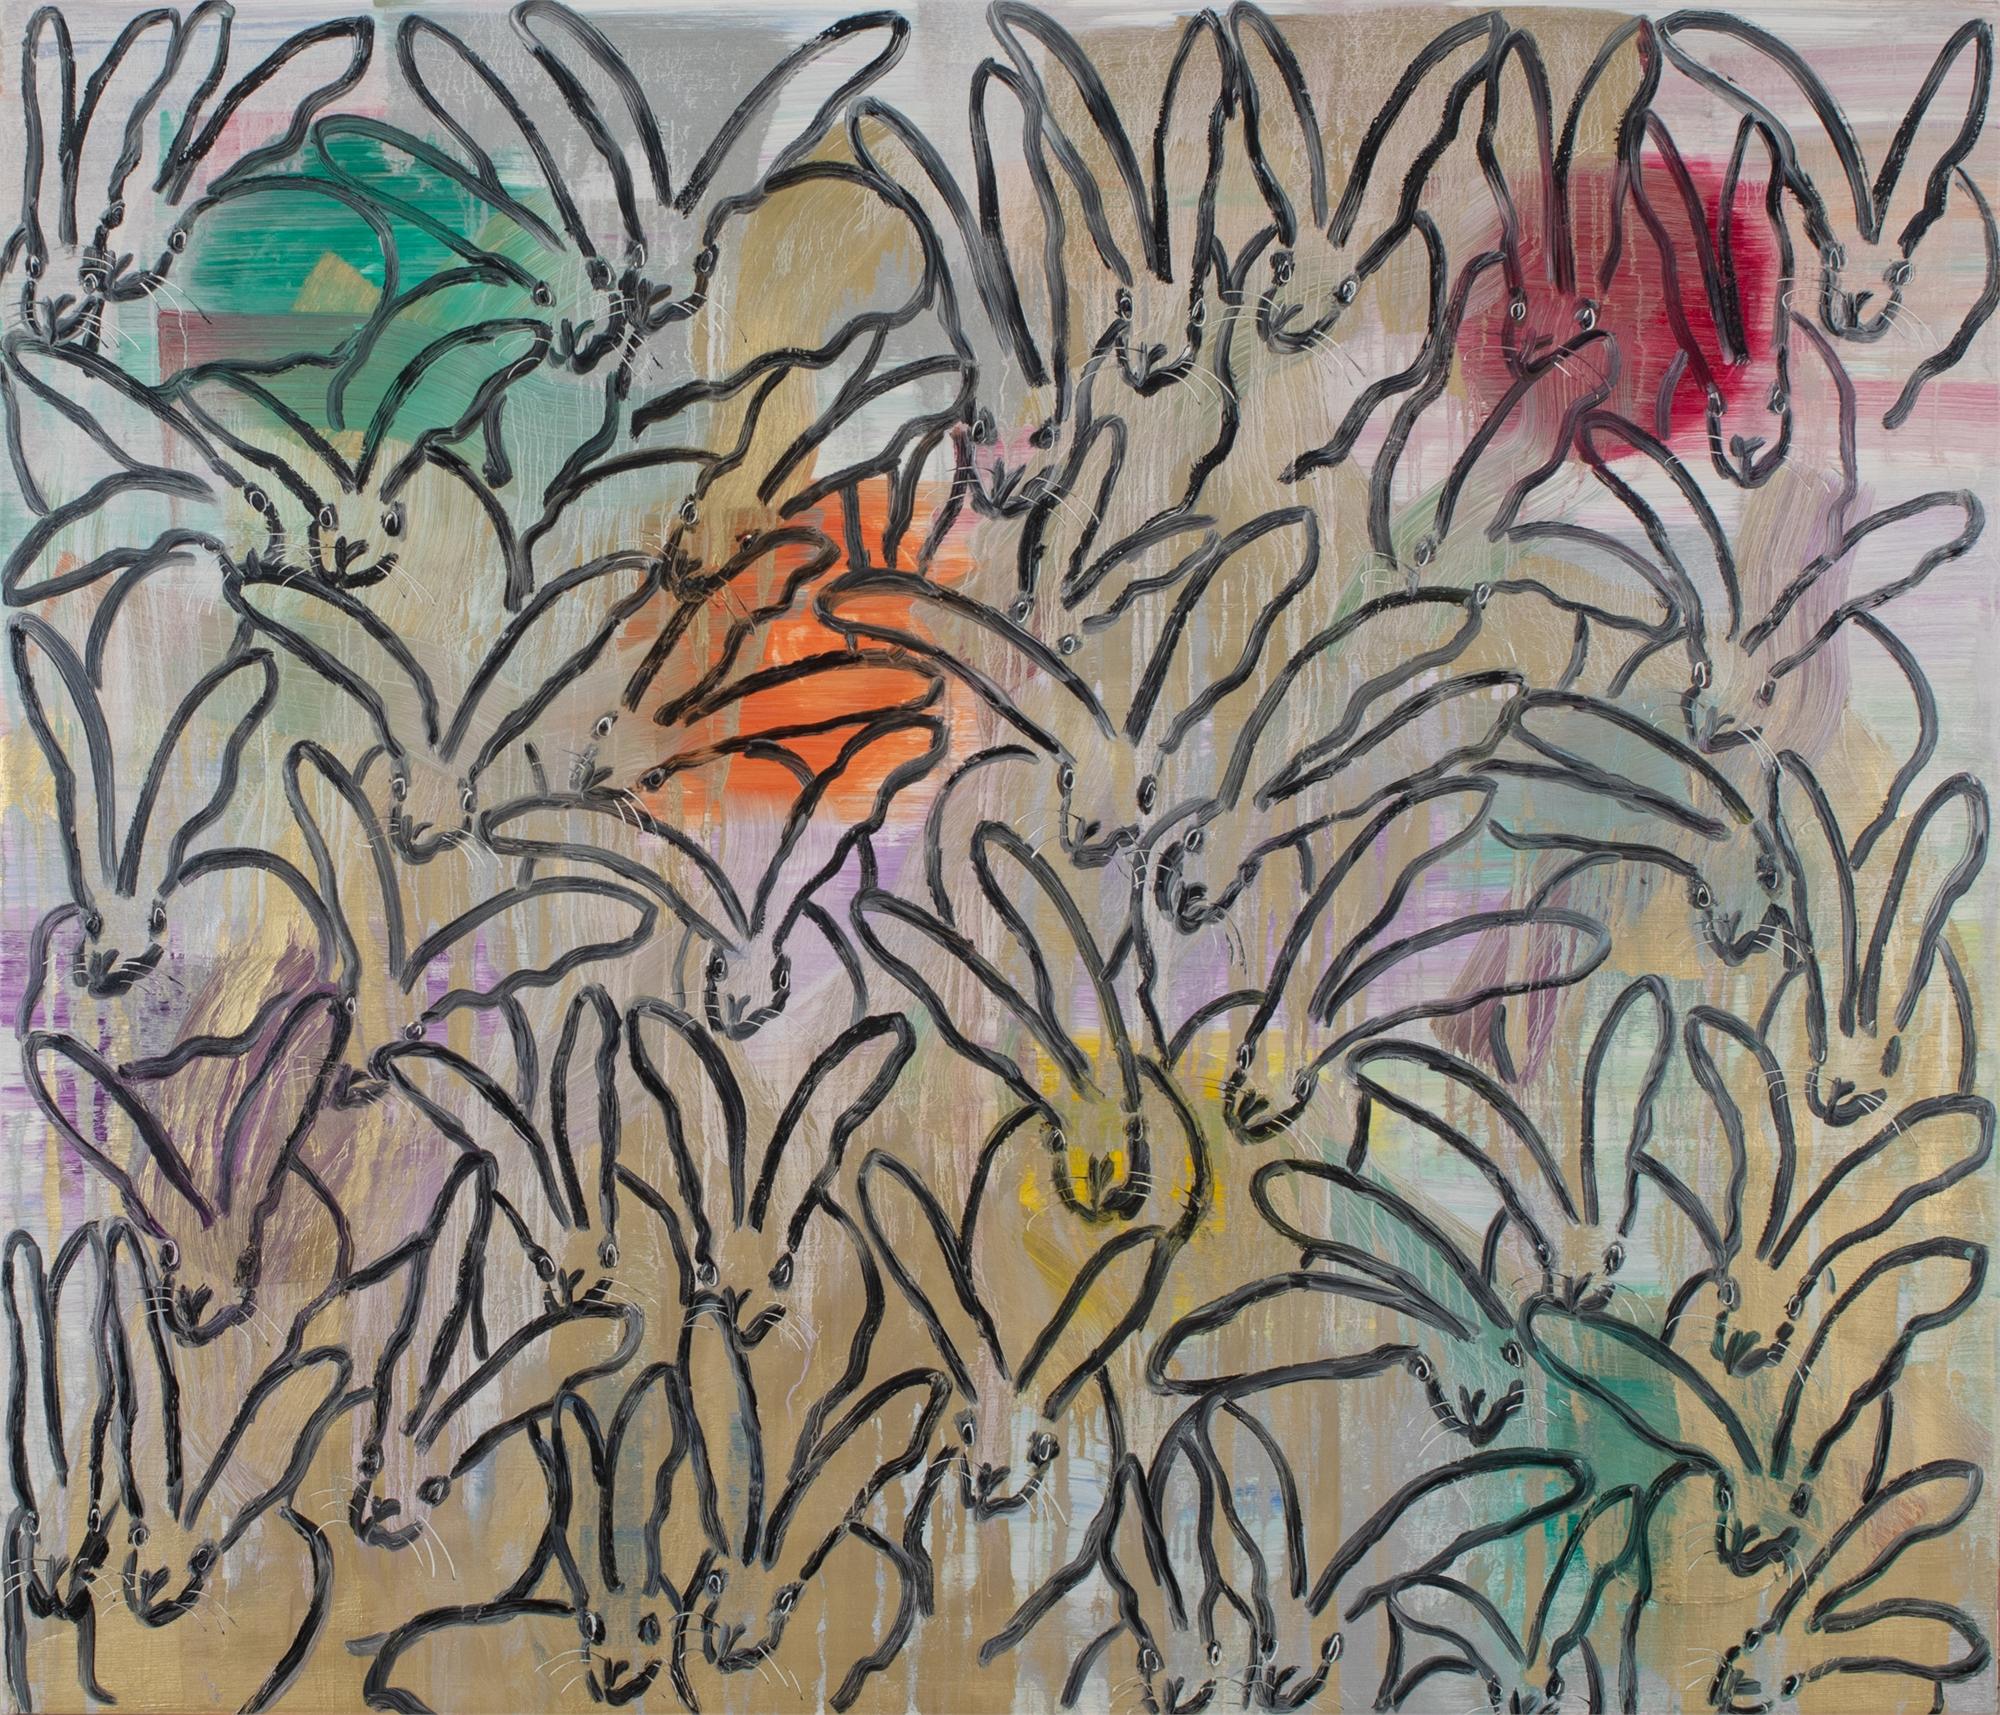 Chinensis La Jolla by Hunt Slonem